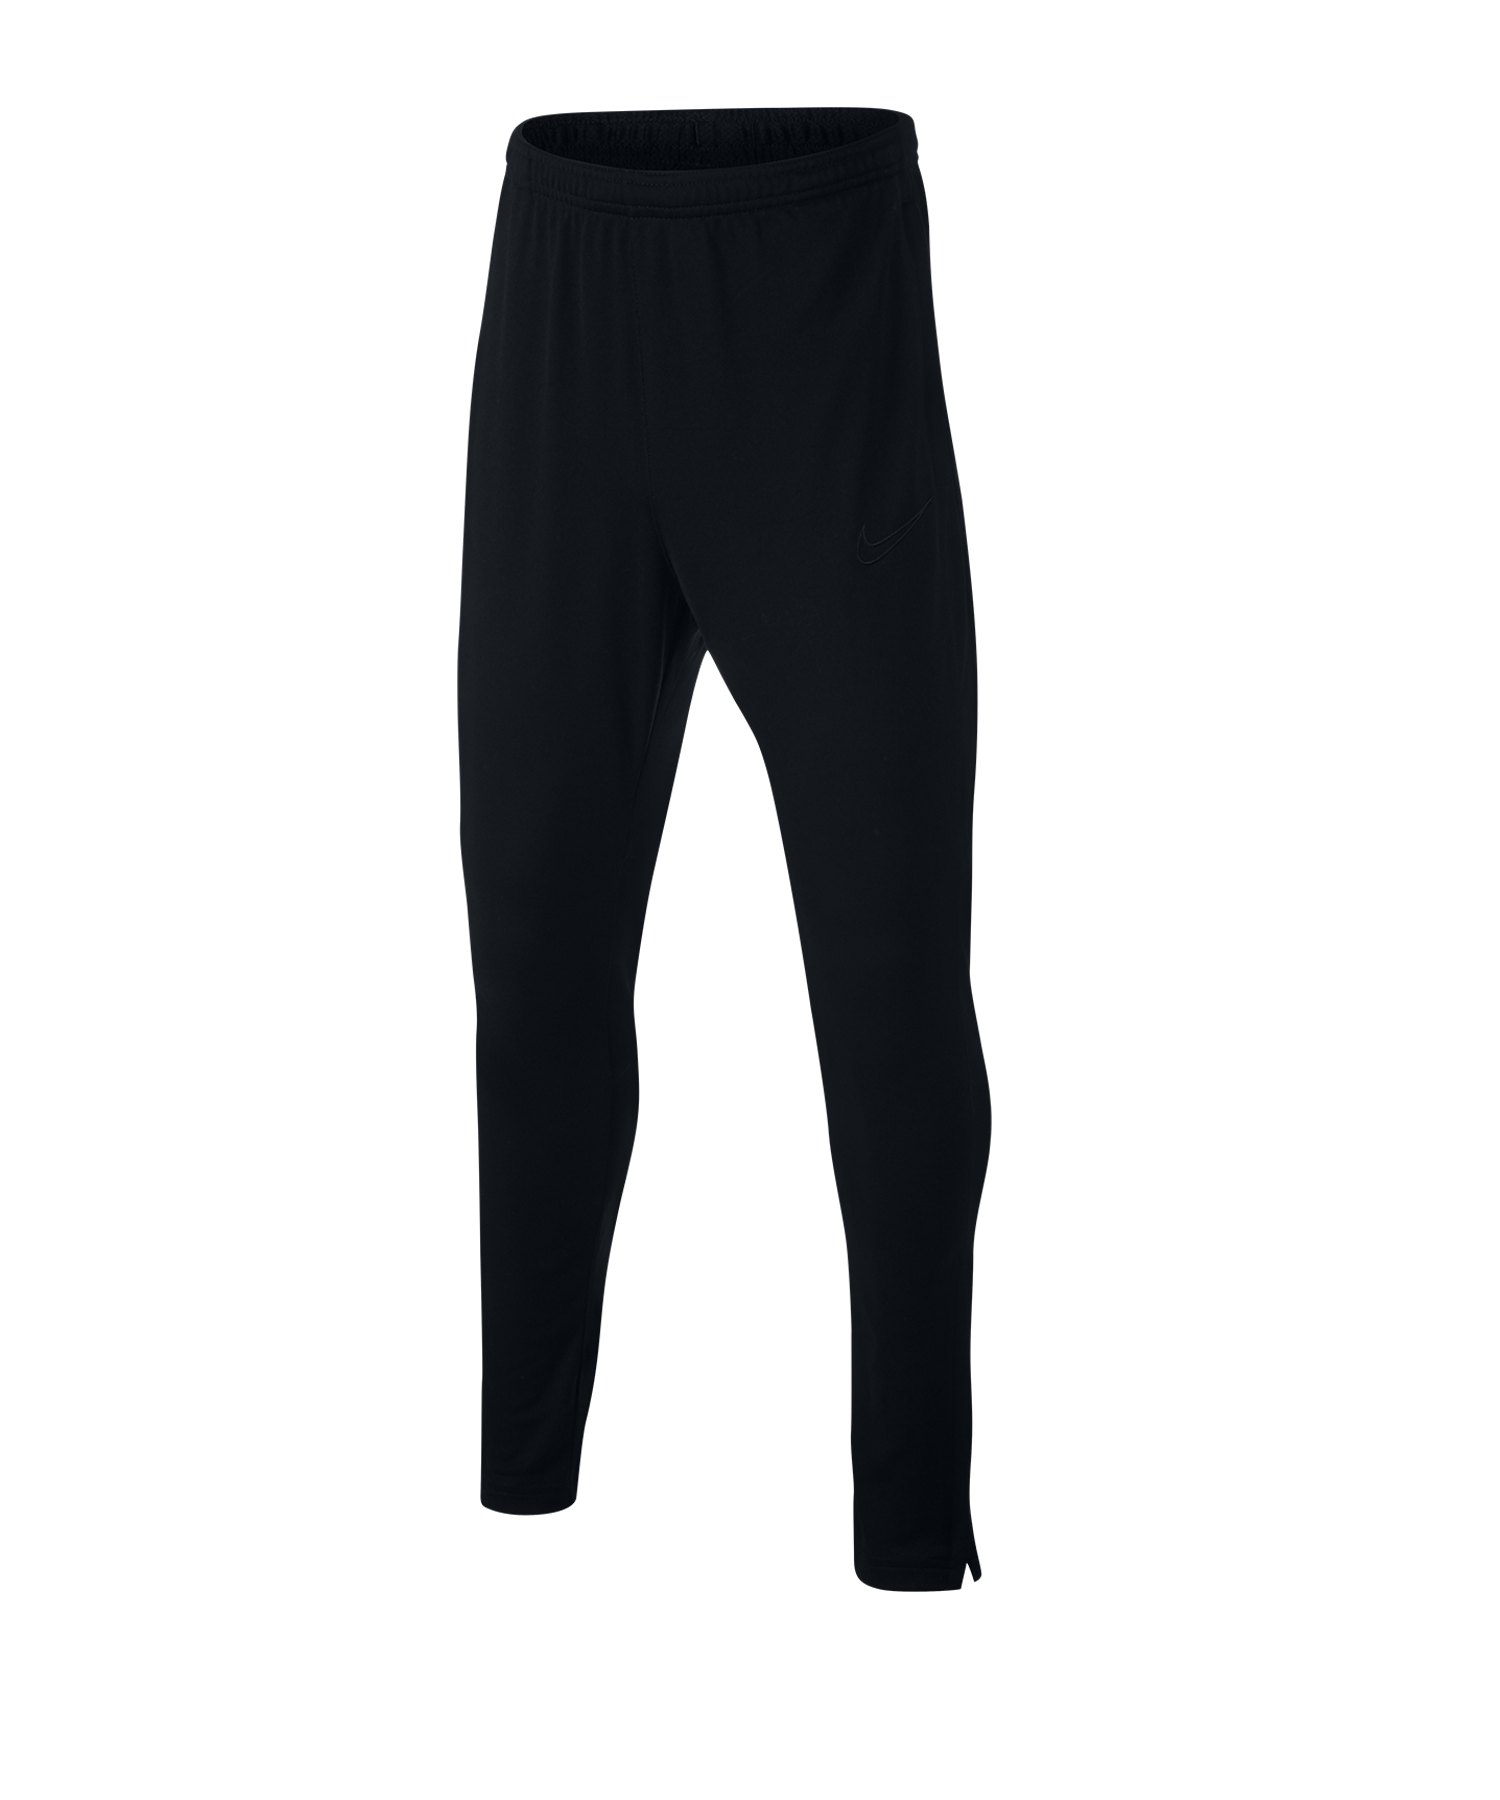 Nike Dry Academy Pant Jogginghose Kids F011 - schwarz